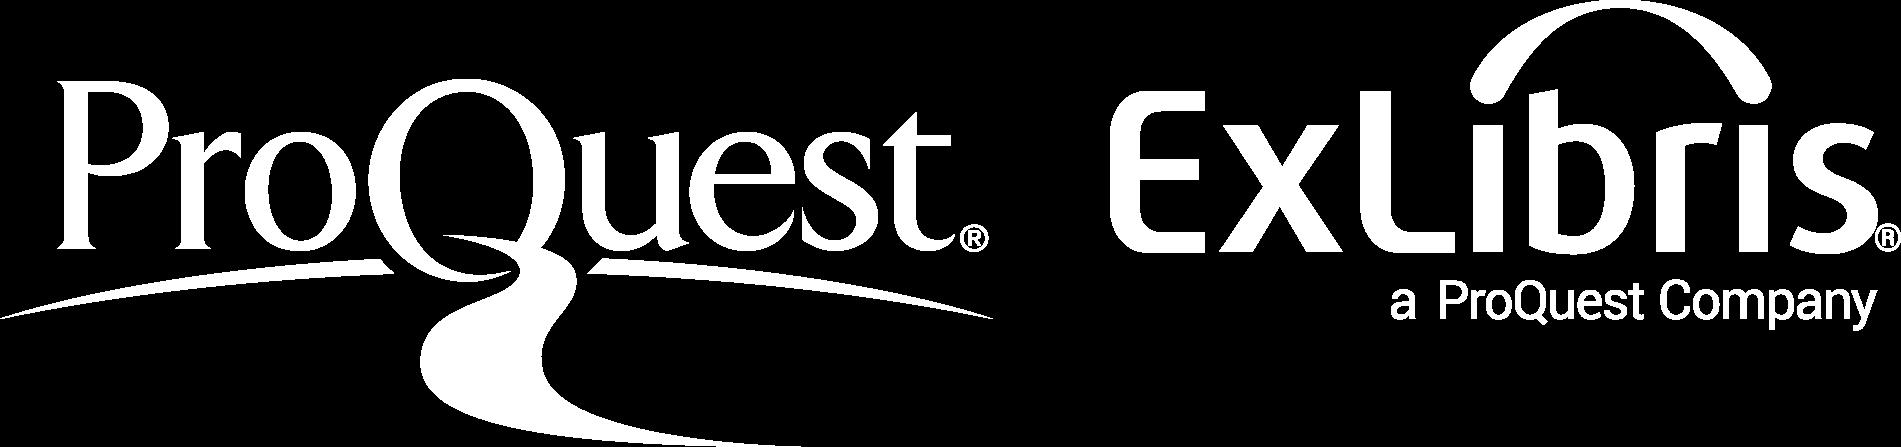 ProQuest/ExLibris Logos